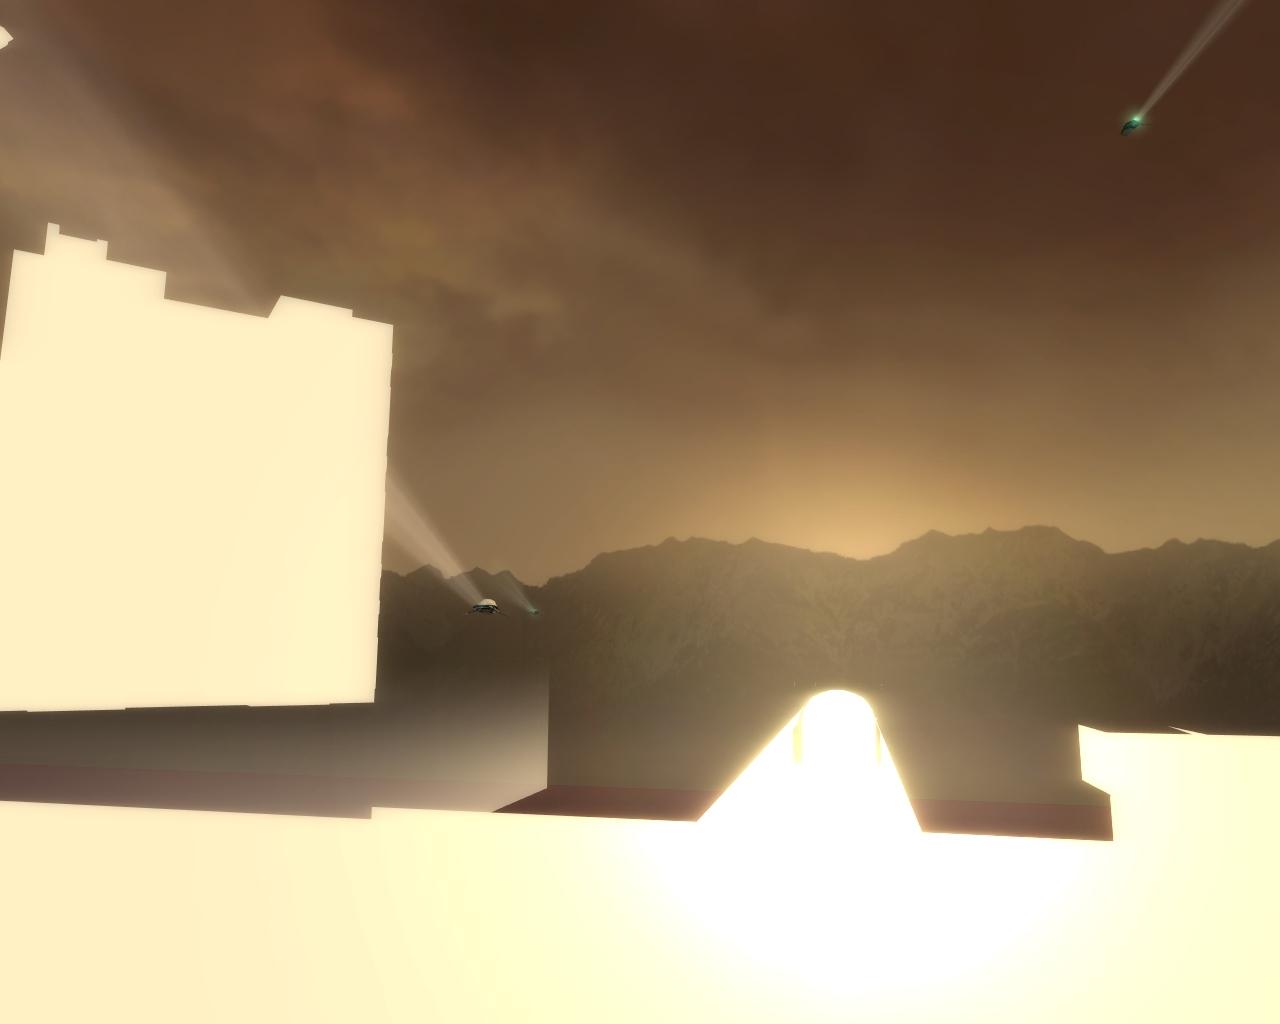 Noclip ON - Half-Life 2